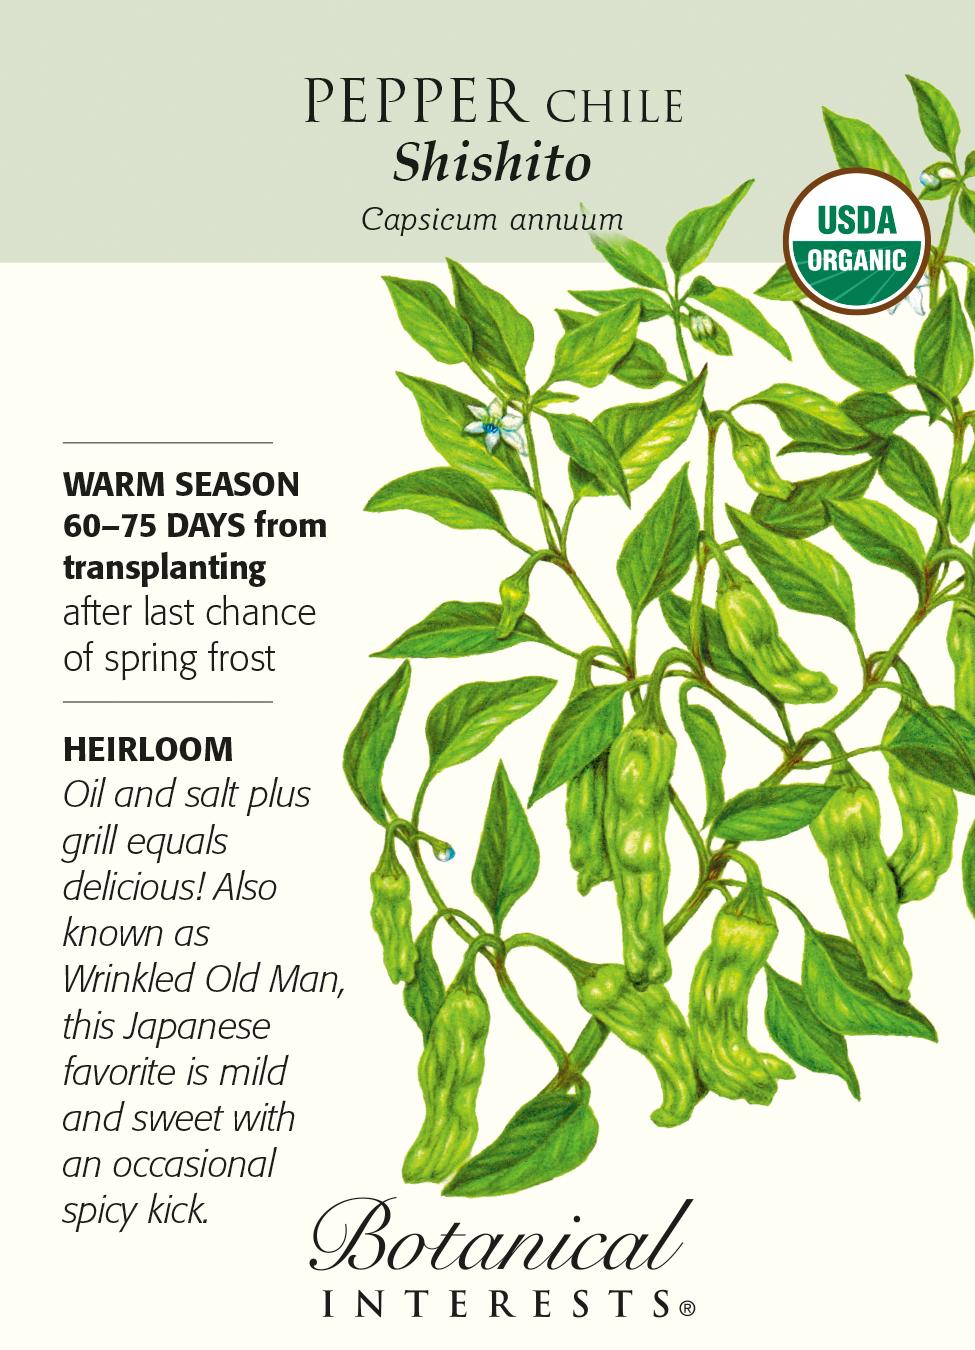 25 Heirloom Shishito Pepper Seeds Organically Grown